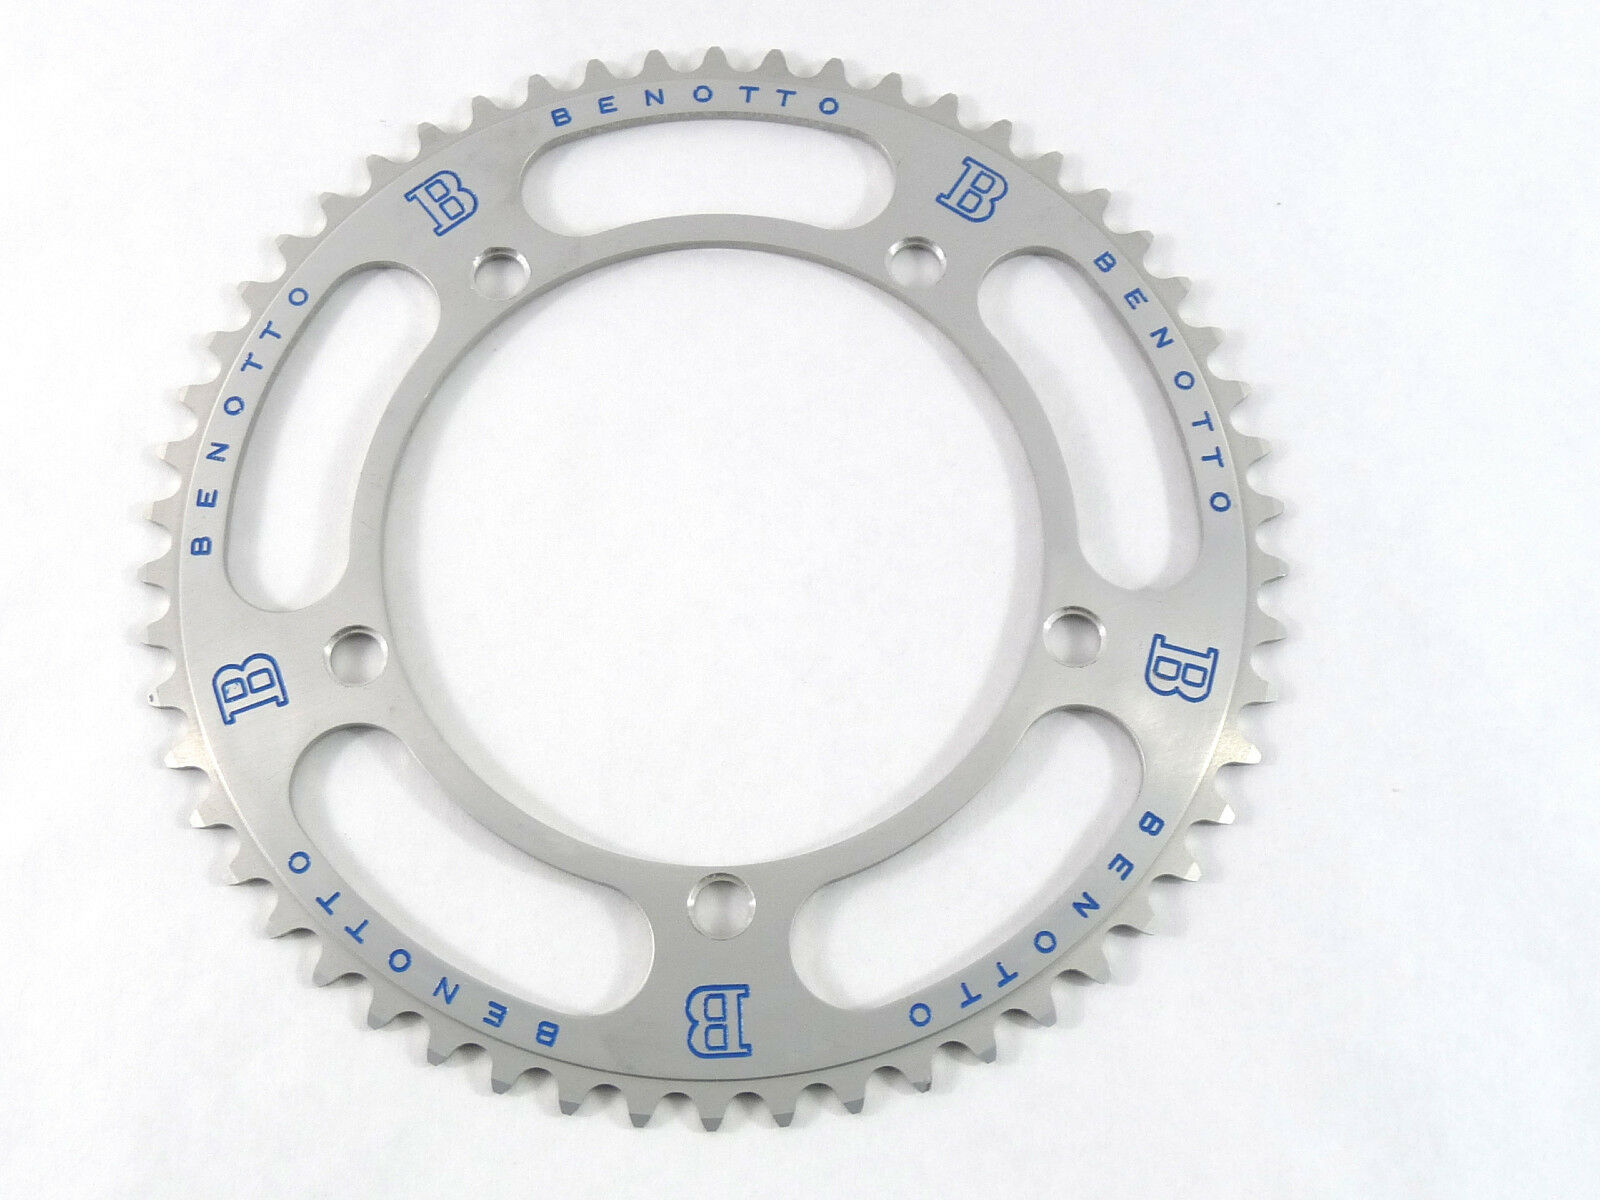 Benotto Pantograph  Chainring 54t 144 BCD 3 32  Vintage Bike Fits CAMPAGNOLO NOS  cheap wholesale